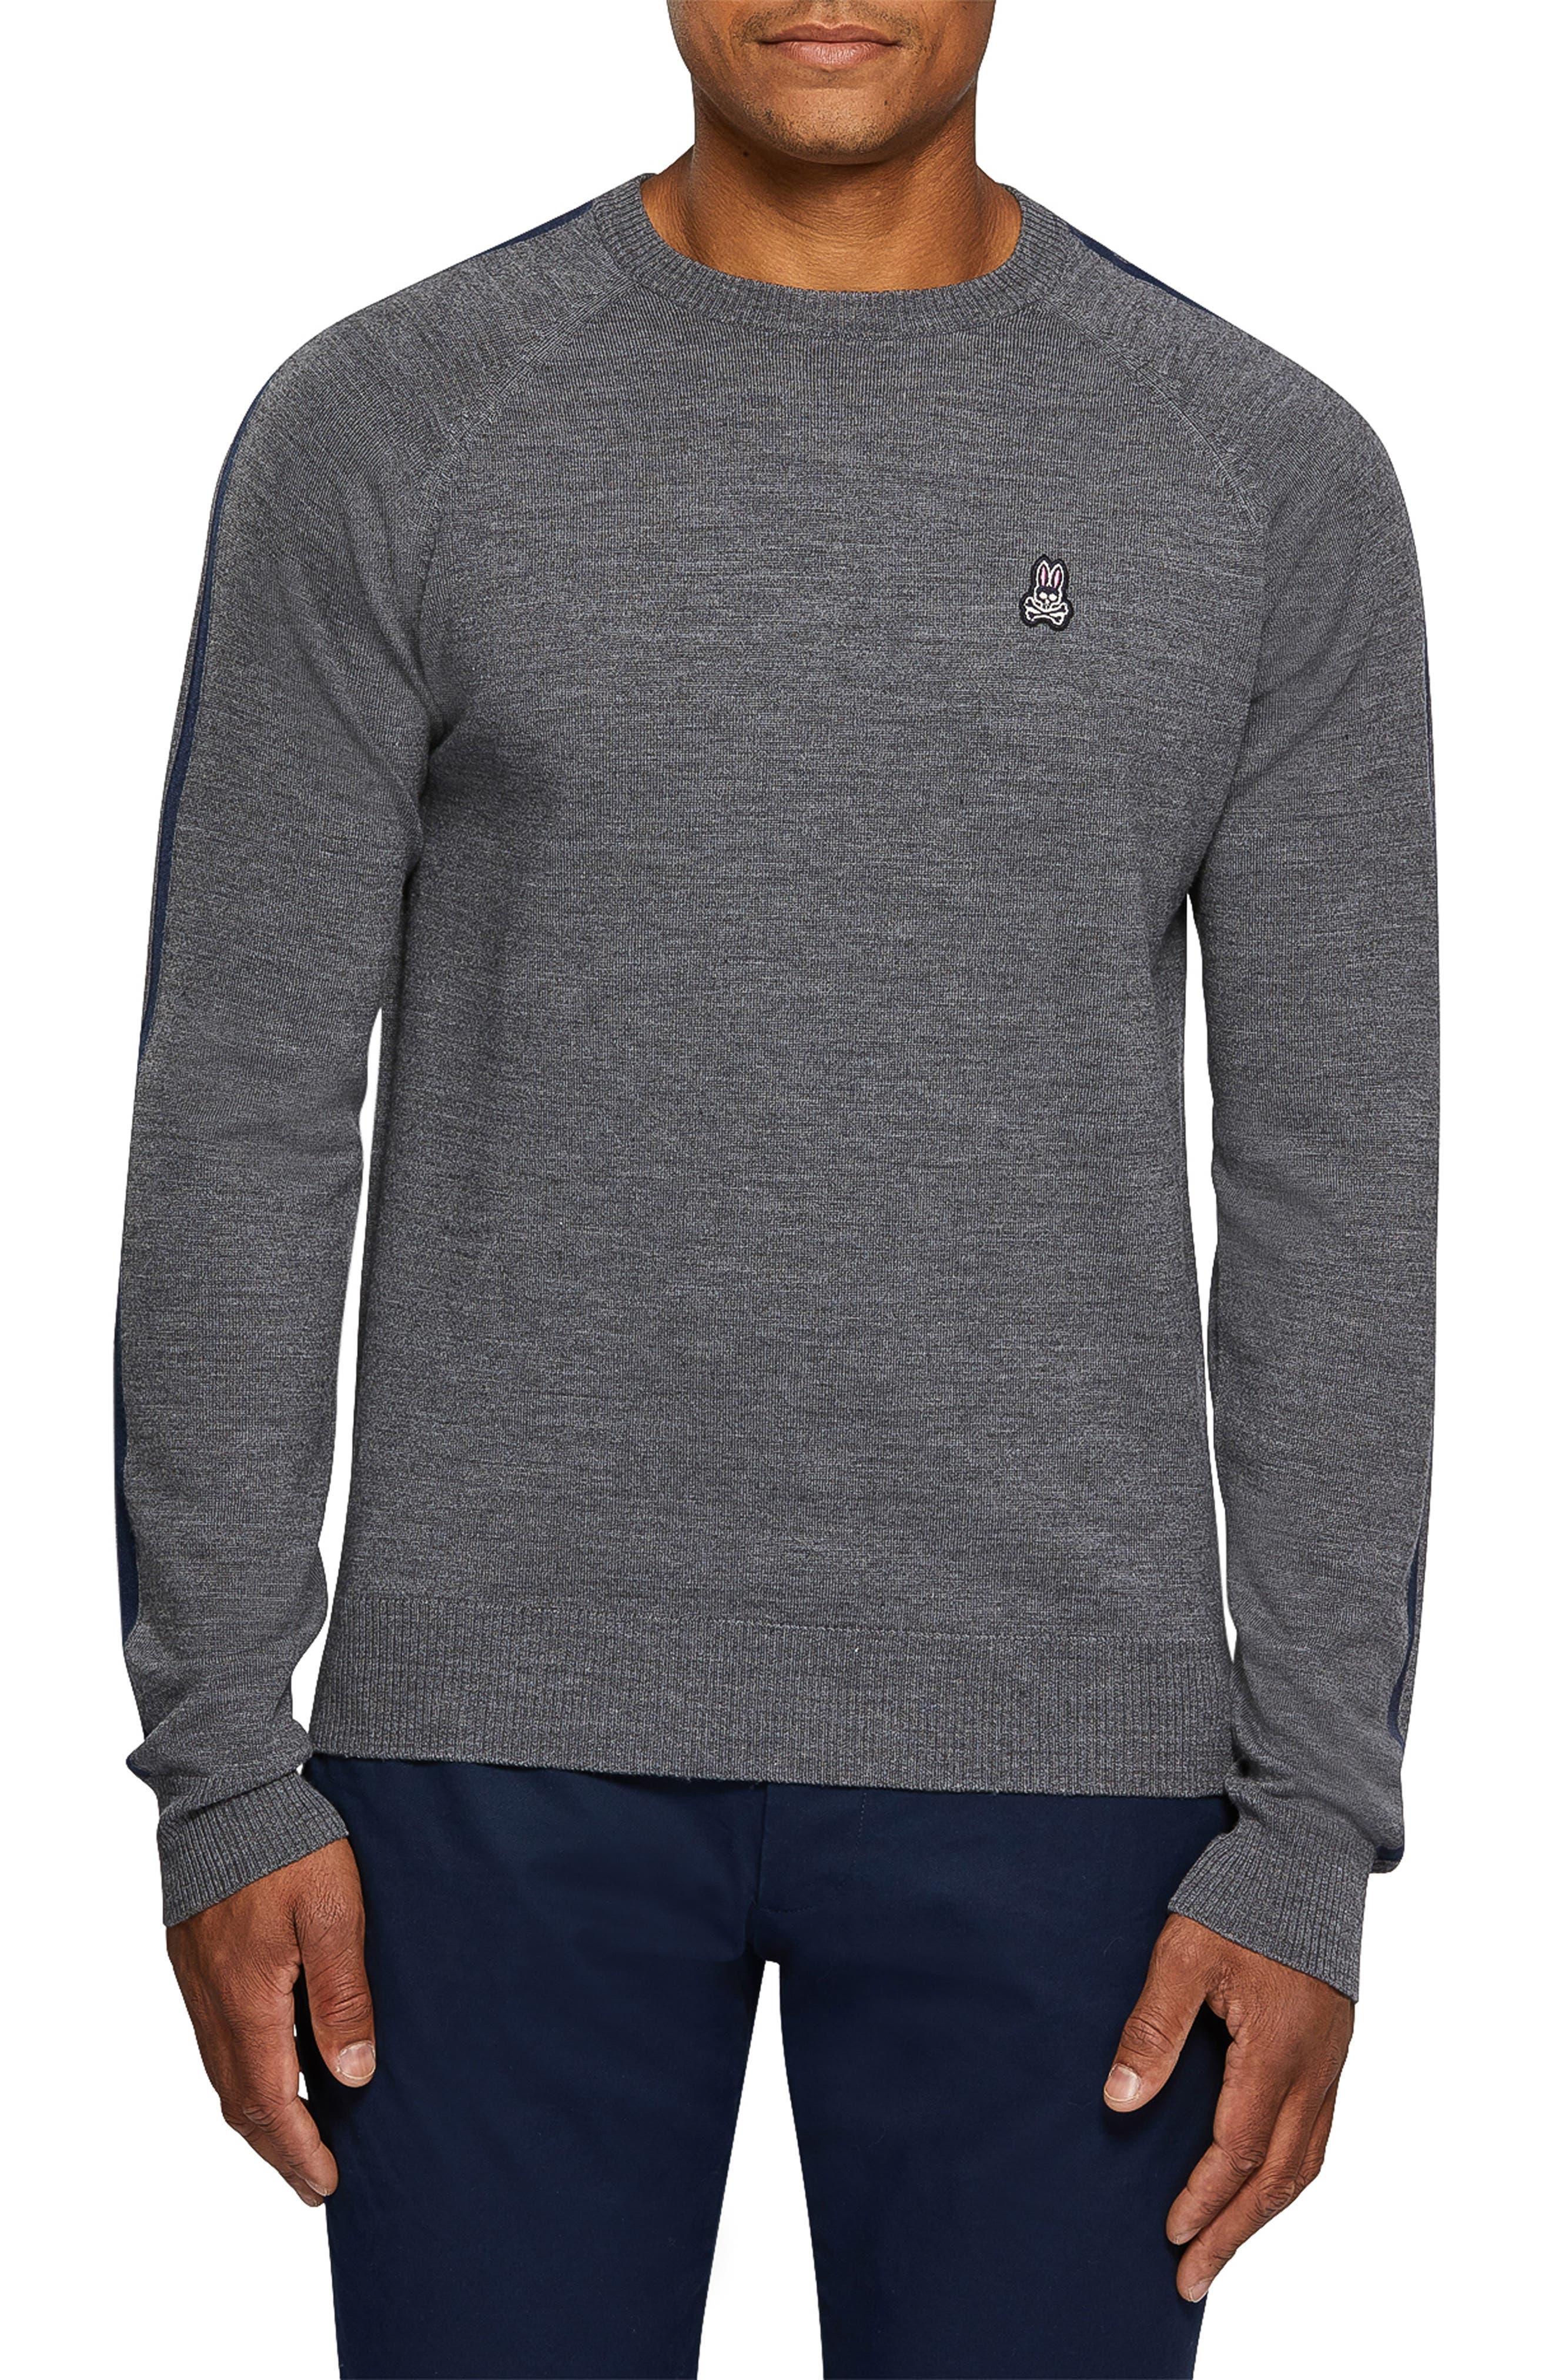 PSYCHO BUNNY Raglan Merino Wool Sweater, Main, color, HEATHER GREY